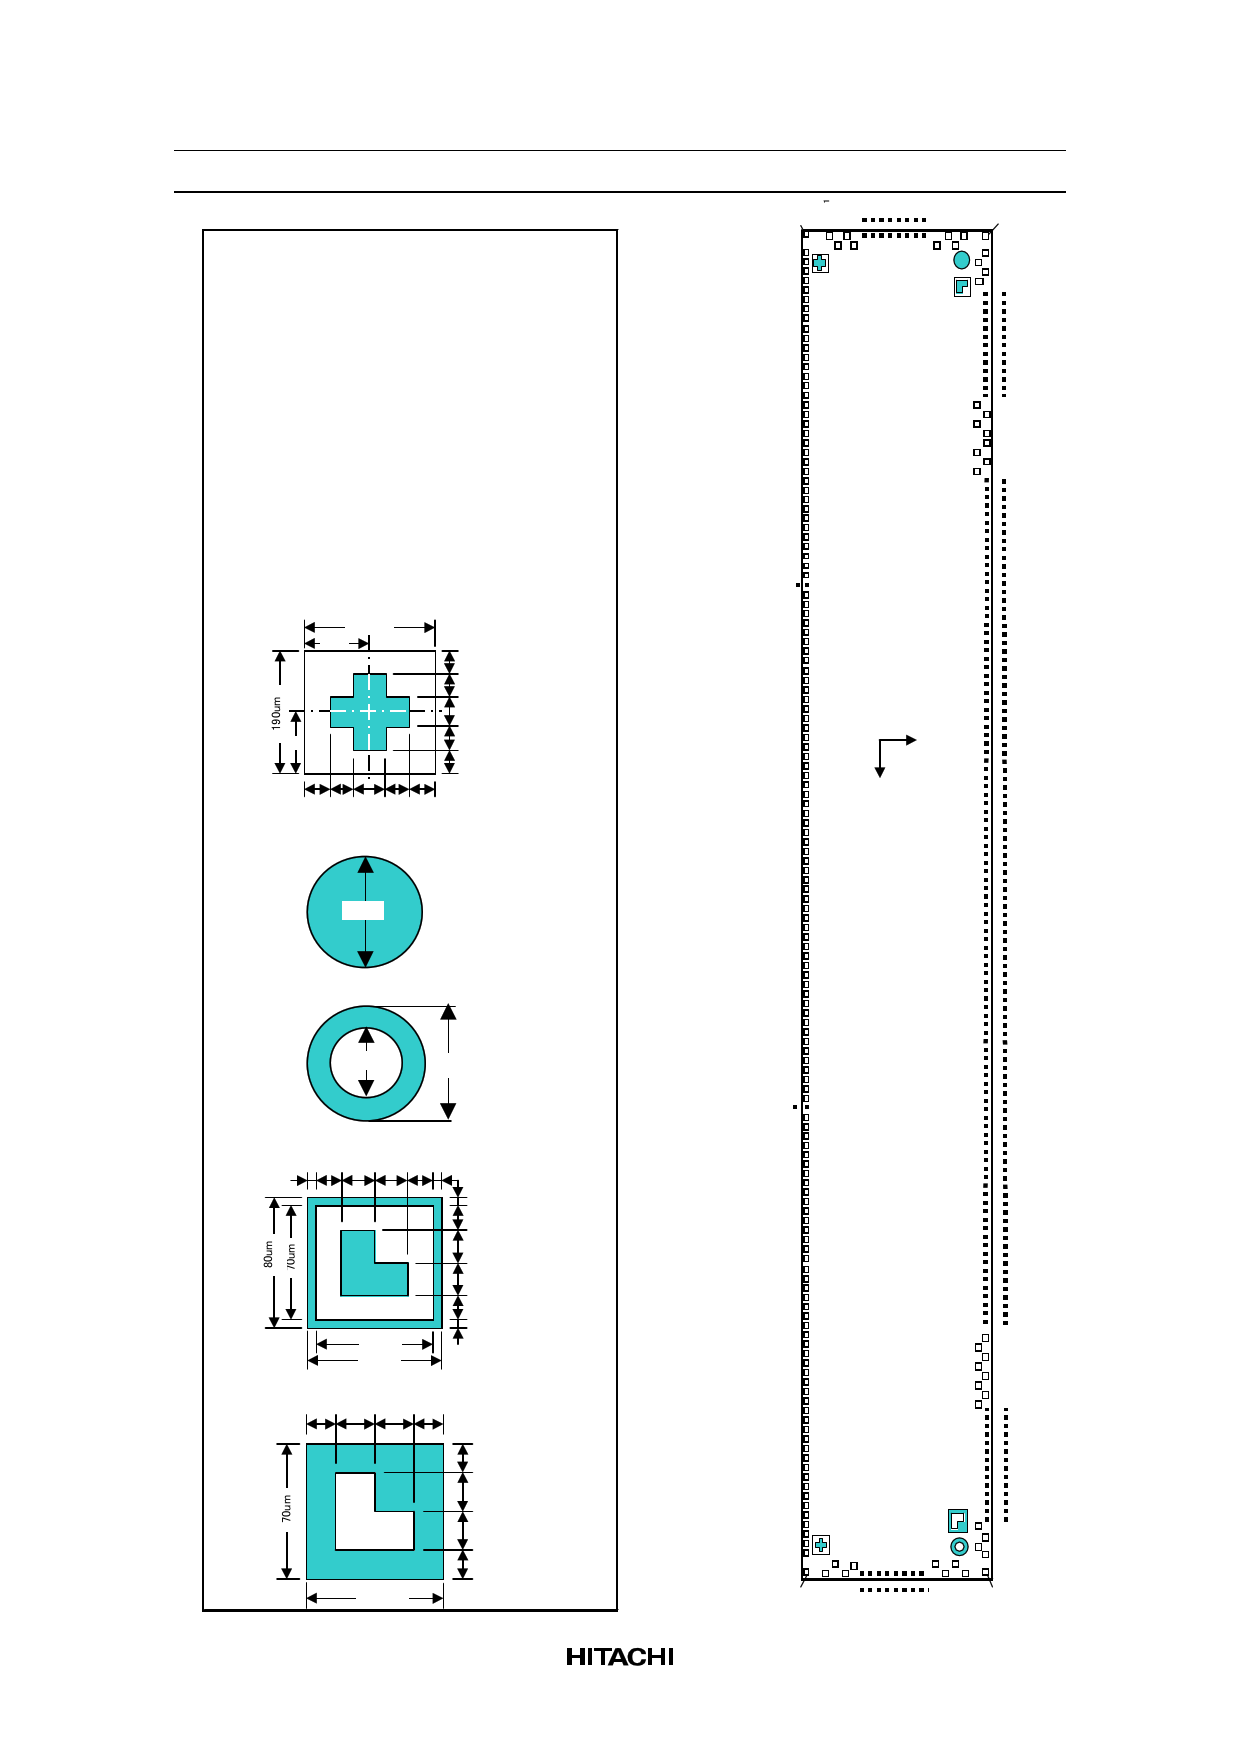 HD66766 Datasheet, Funktion